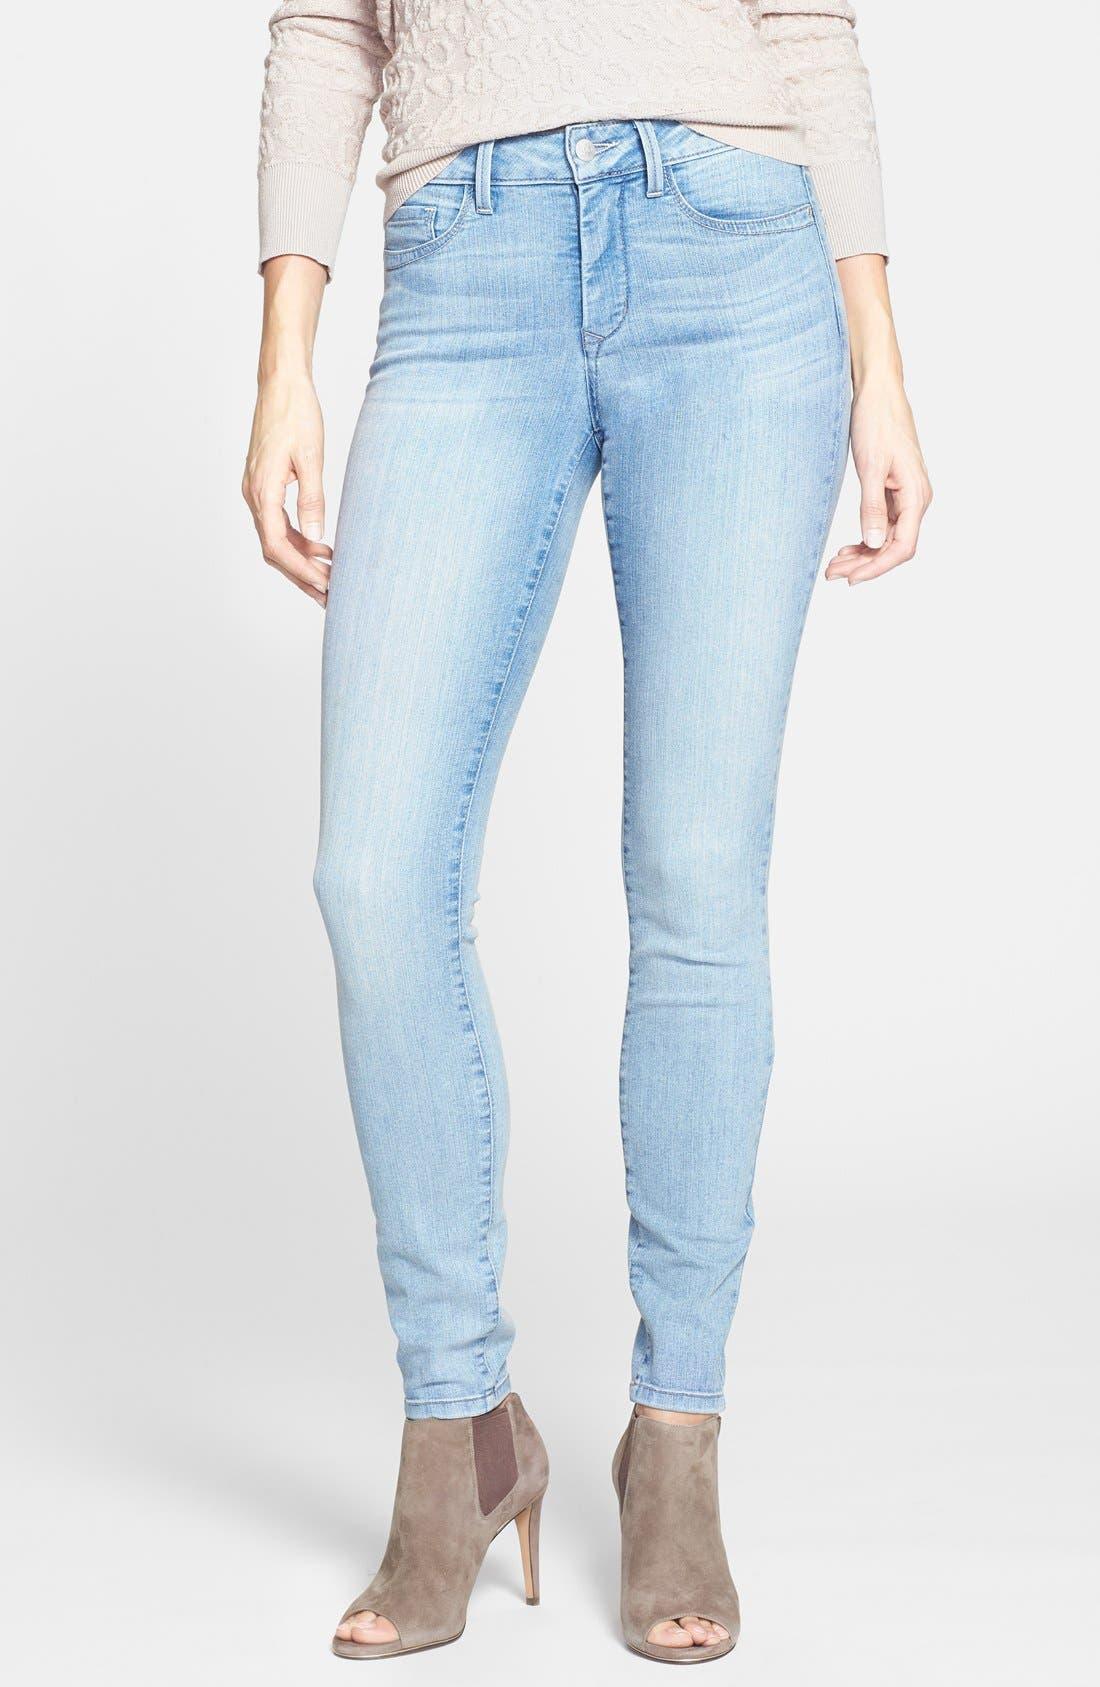 Main Image - NYDJ 'Ami' Stretch Skinny Jeans (Manhattan Beach)